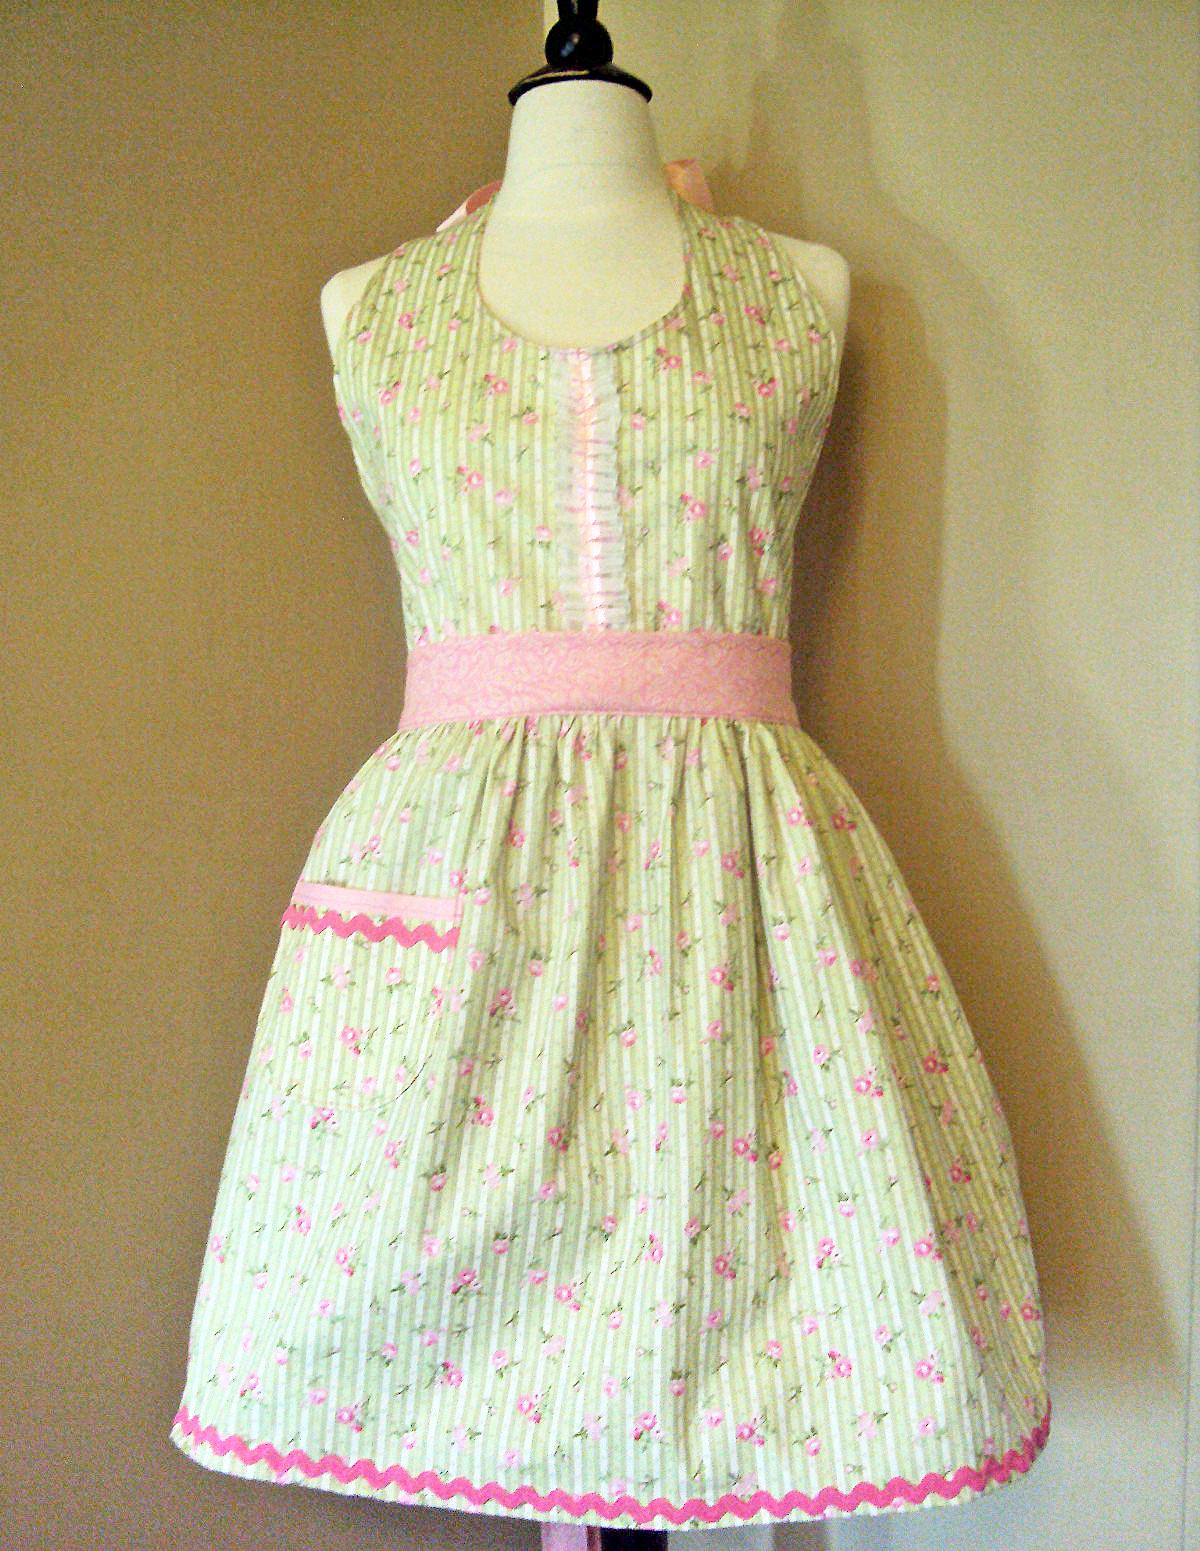 White half apron ebay - Http Www Ebay Com Itm Vintage Style Apron Womens Full Size Retro Apron Shabby Cottage Chic 190649854032 Pt Lh_defaultdomain_0 Hash Item2c639de850